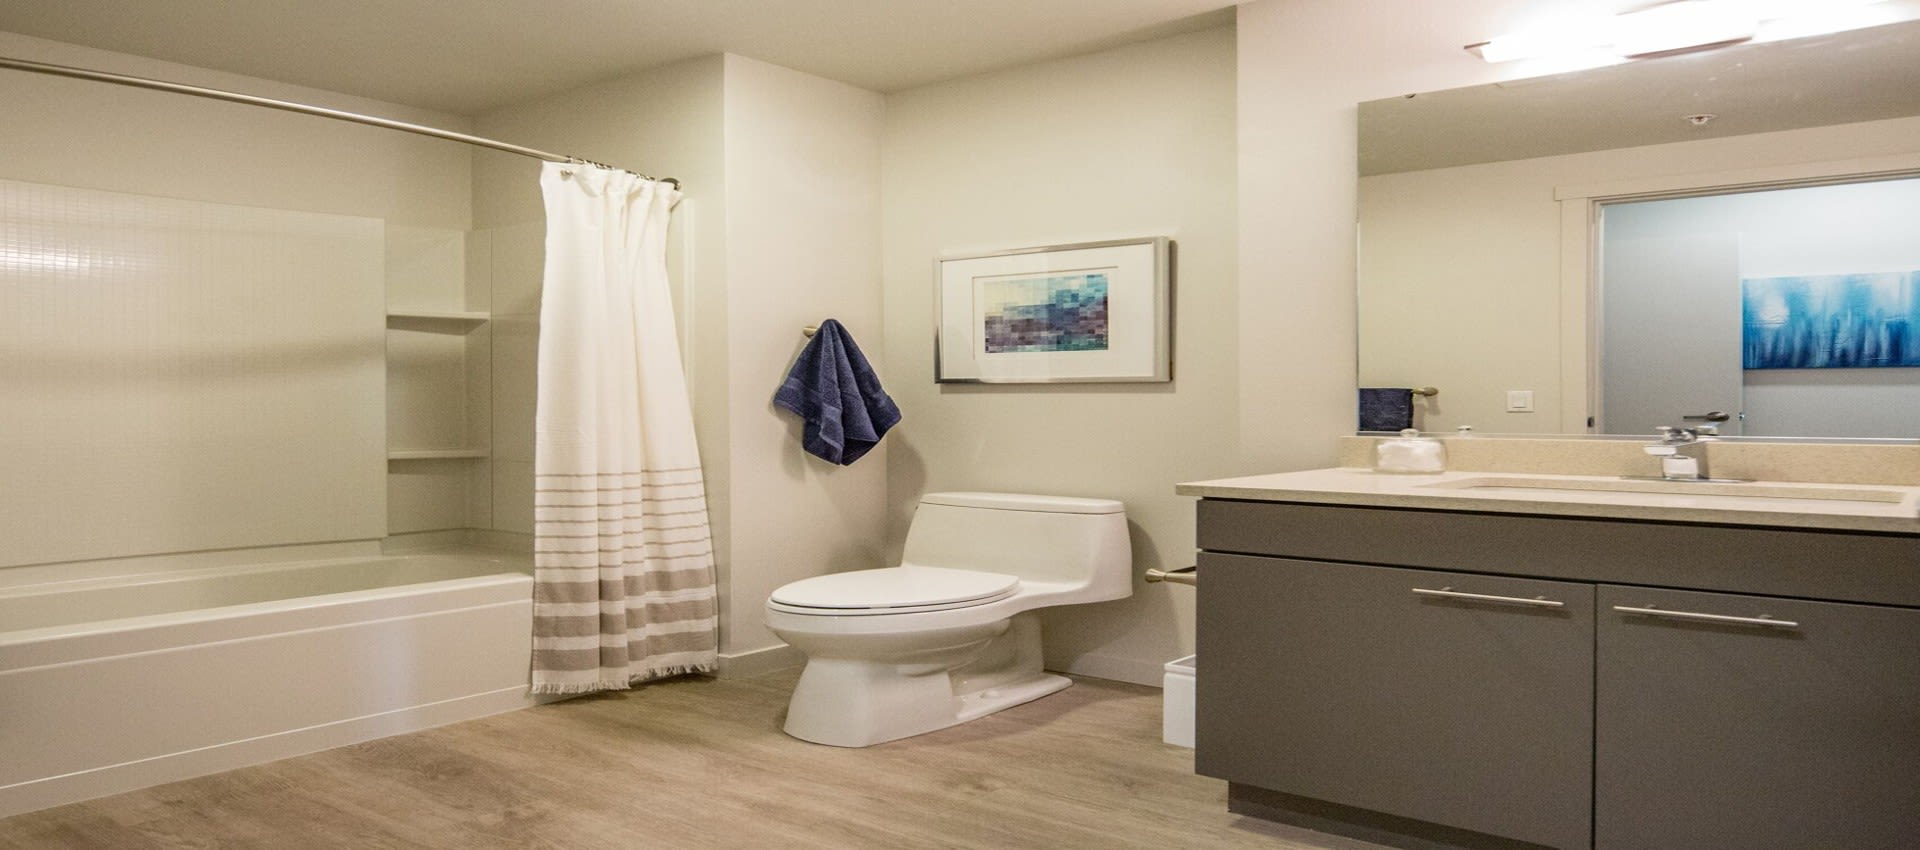 EVIVA Midtown bathroom in Sacramento, California